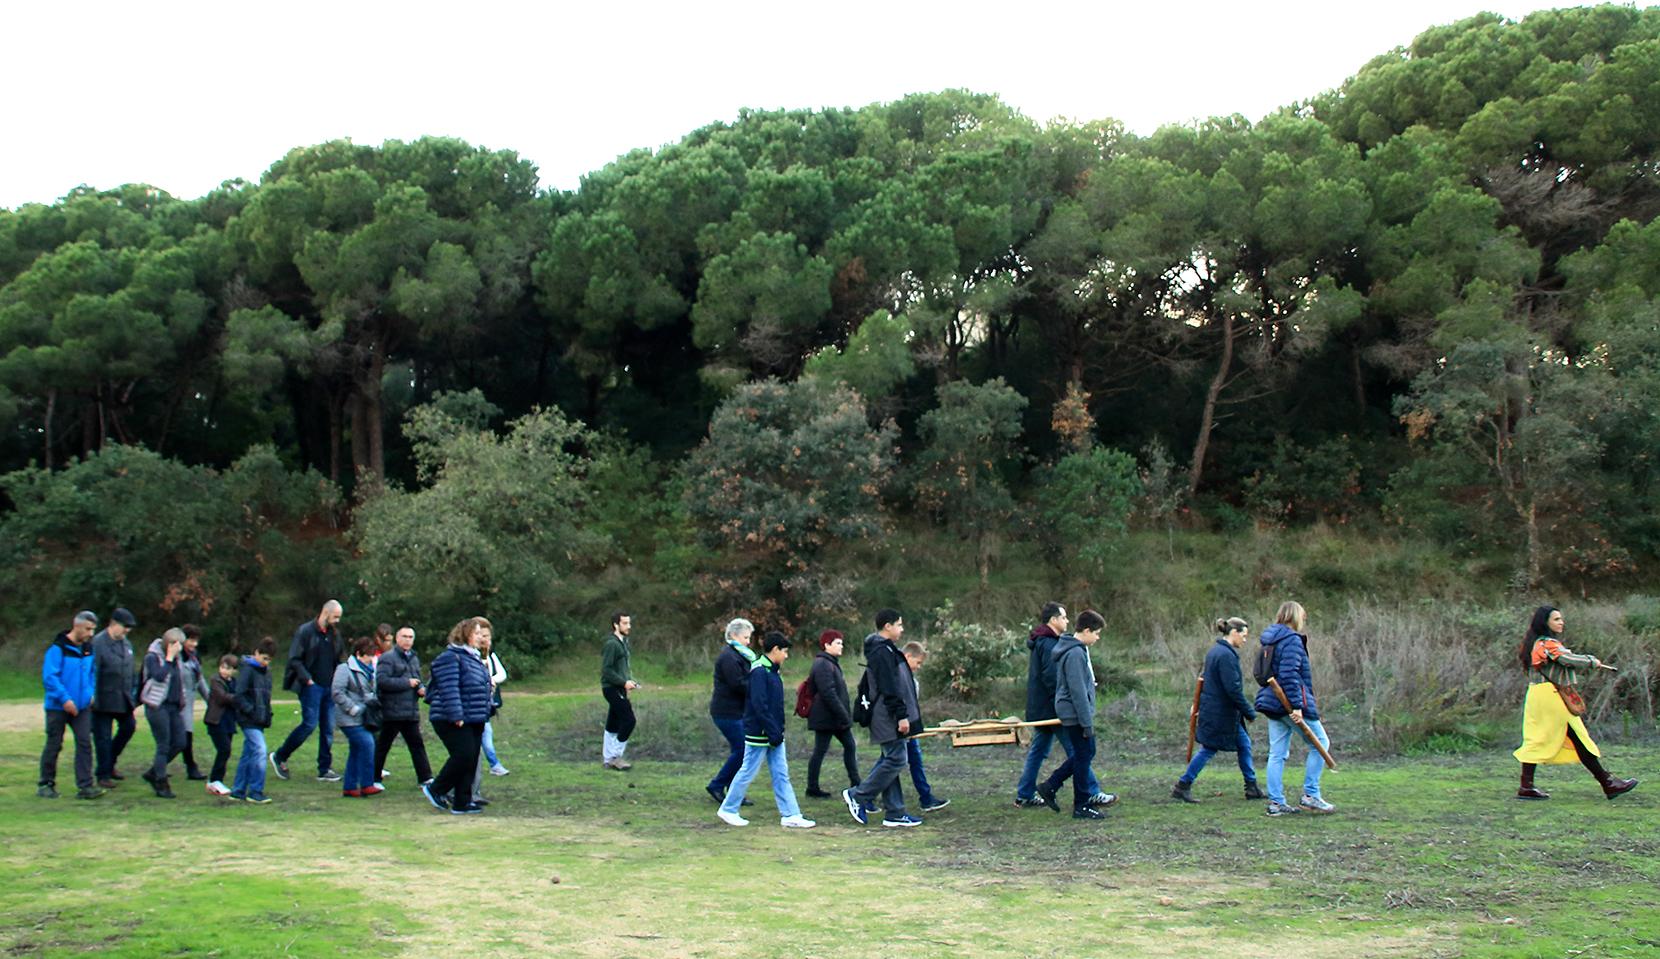 ohtli en Arrela't 2018 (Malgrat de Mar, Catalunya) - Foto de Sebastián Troncoso 6.jpg